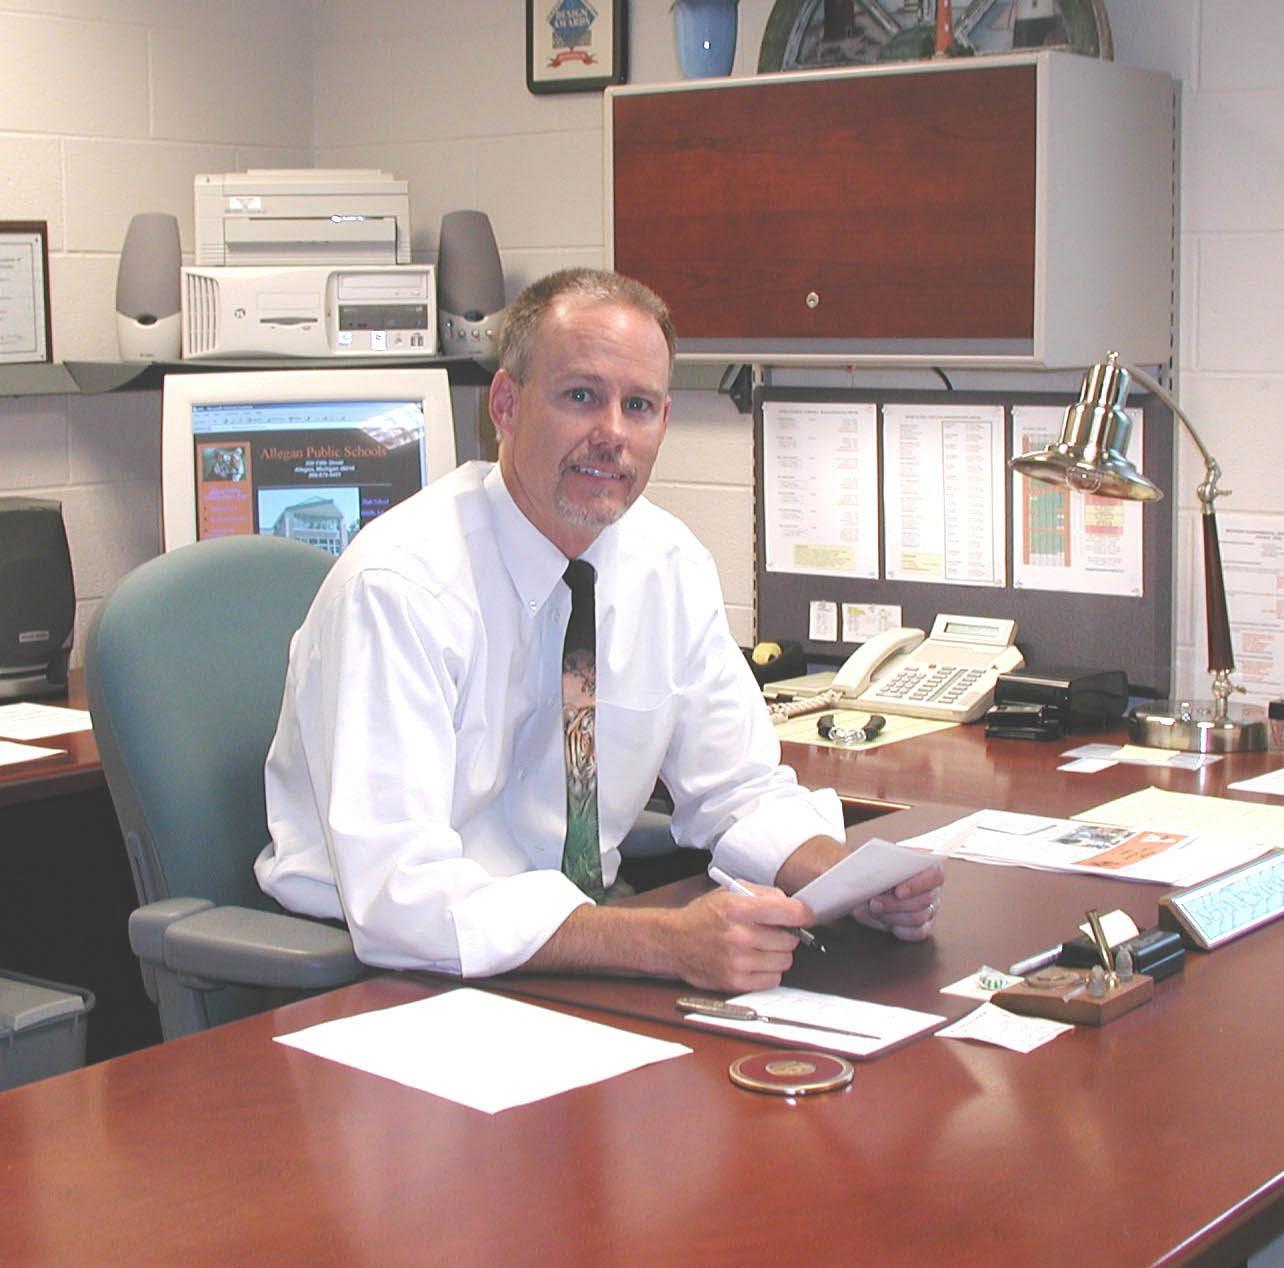 Allegan Public Schools Superintendent Kevin Harness